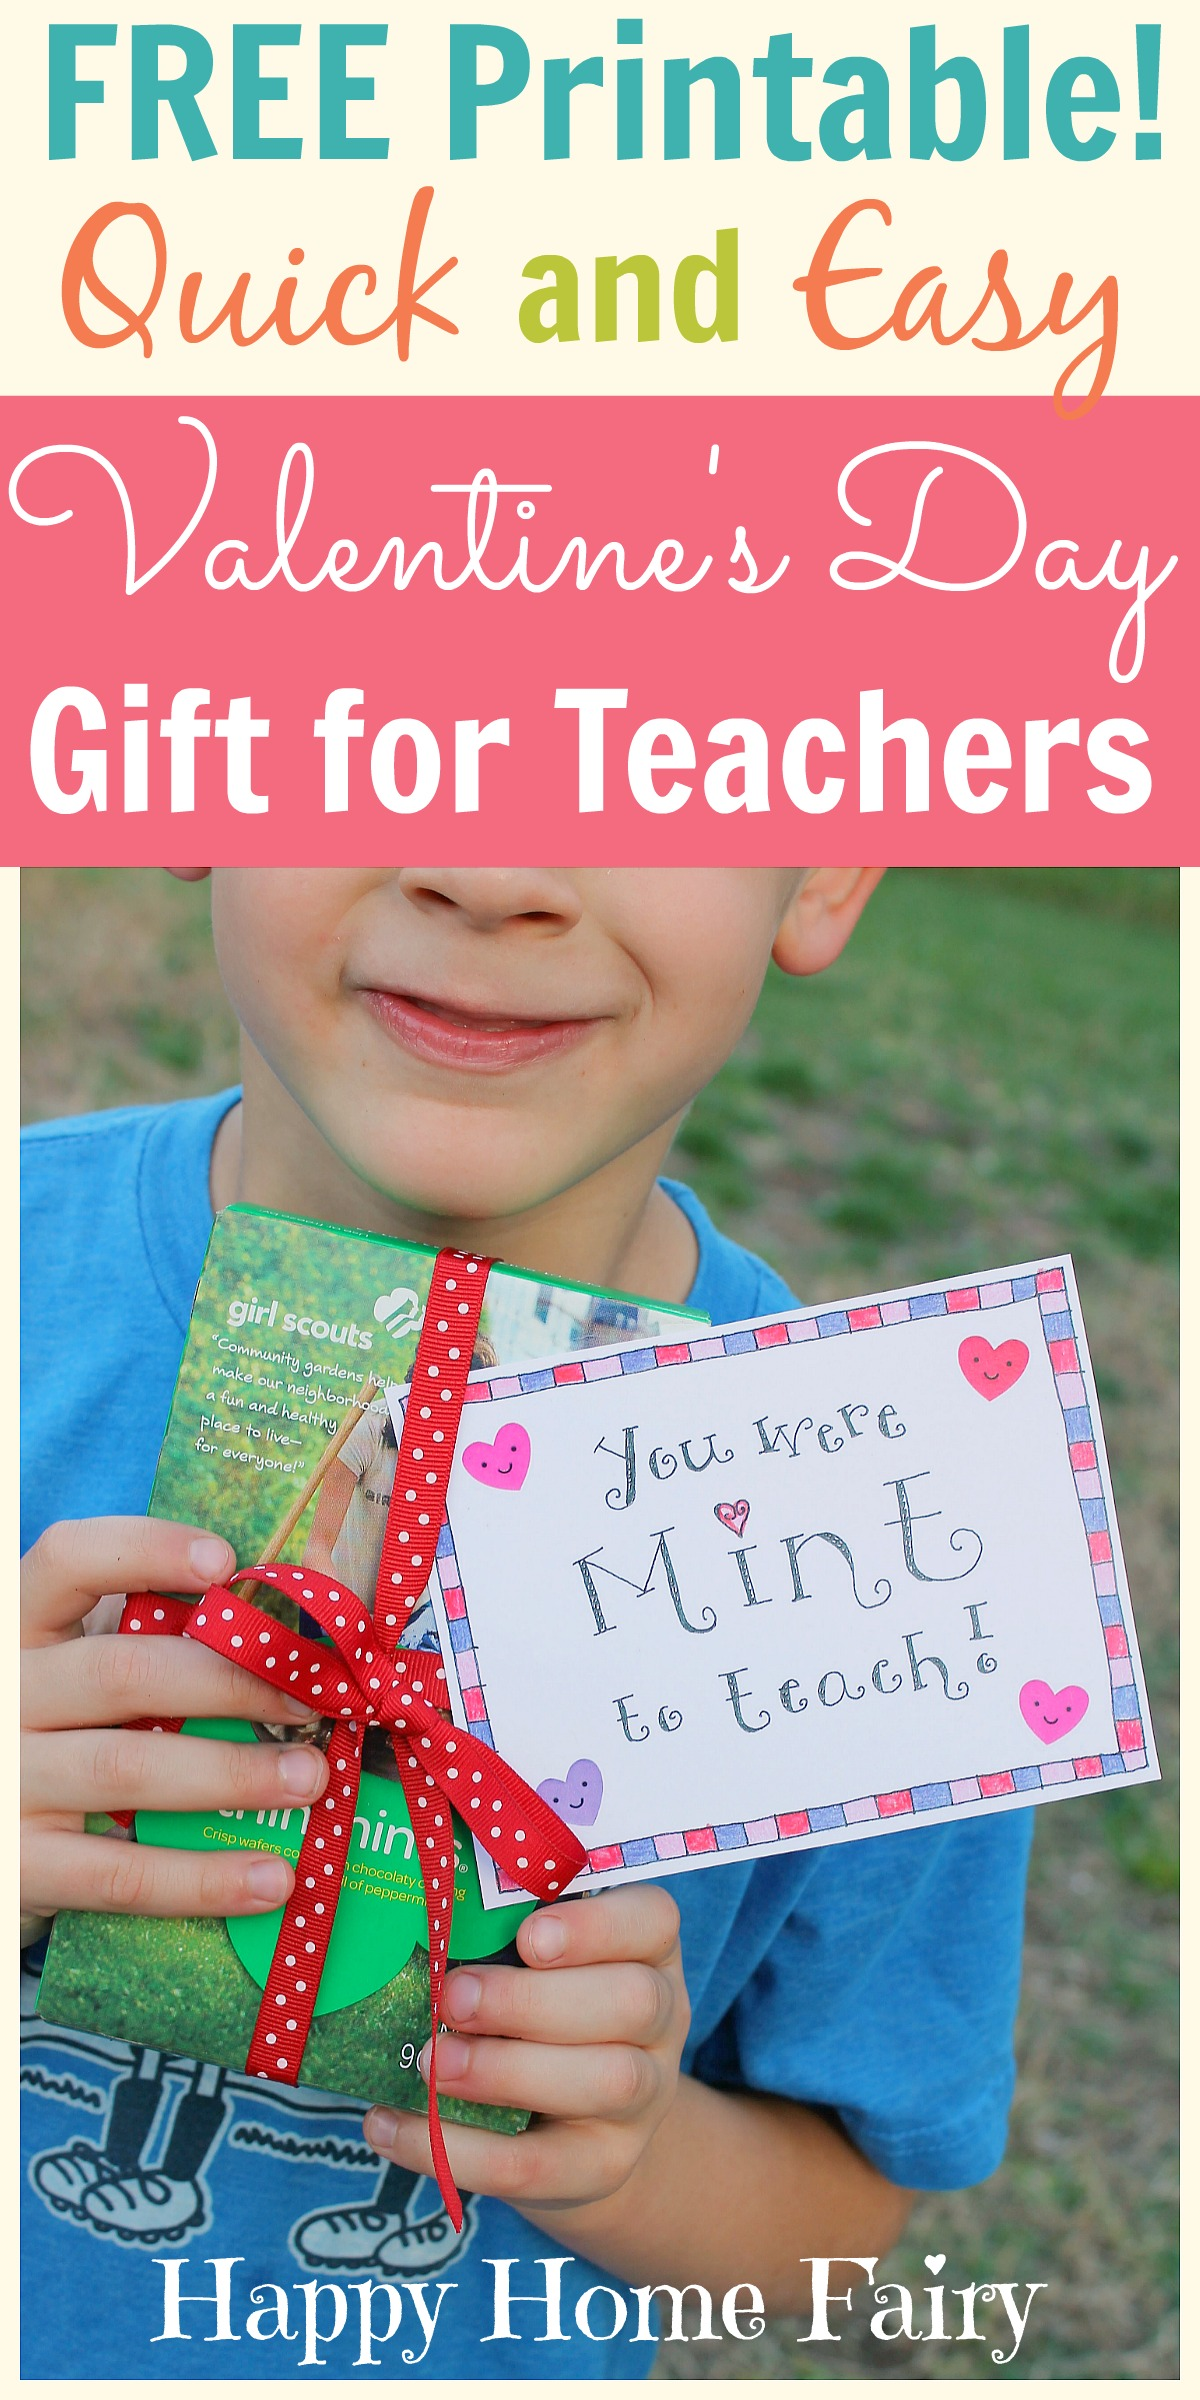 photo regarding Teacher Valentine Printable identify Straightforward Valentines Working day Present for Academics - Absolutely free Printable